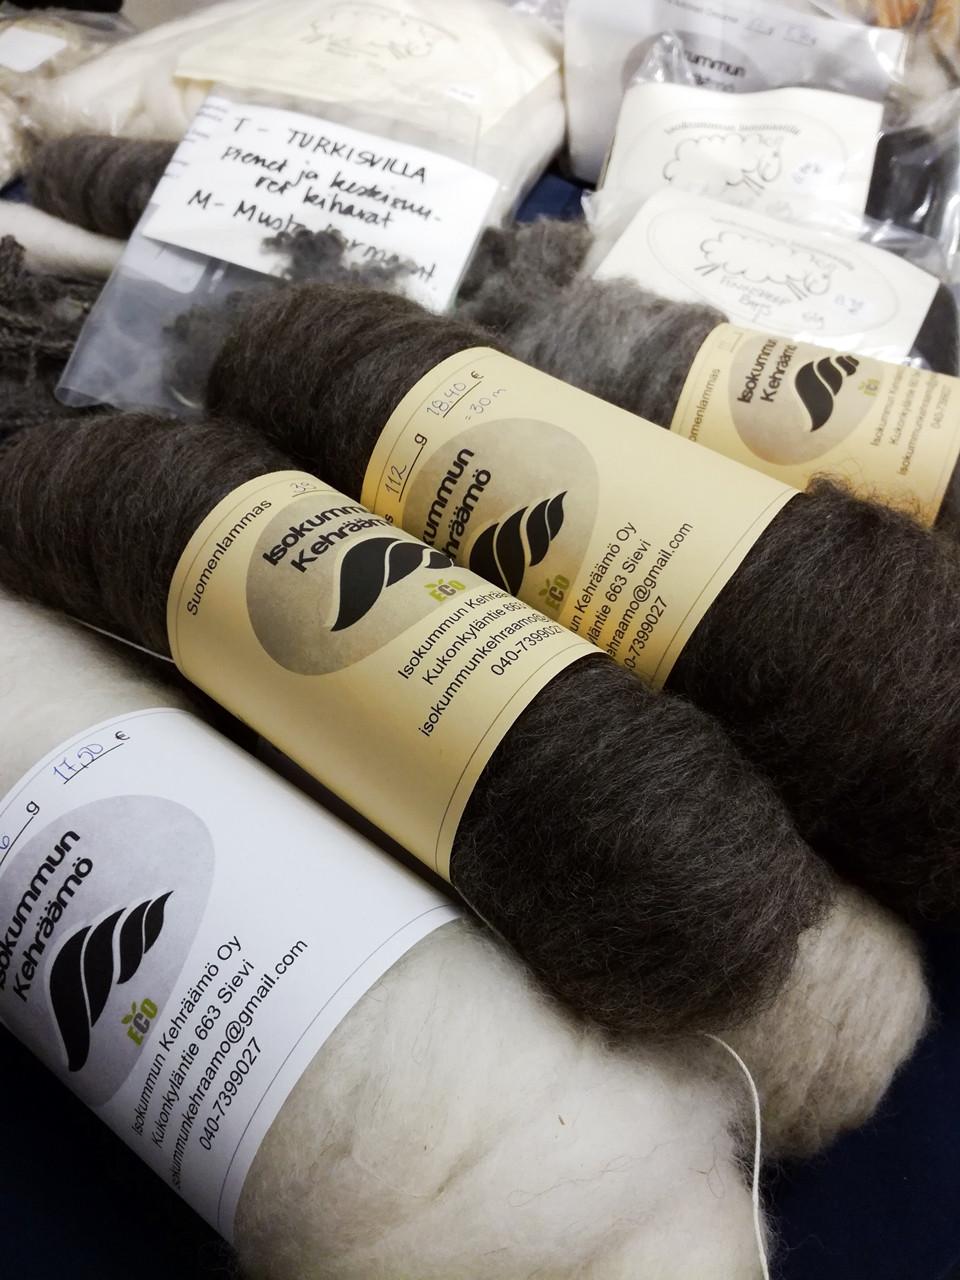 Finnsheep wool from Isokummun tila